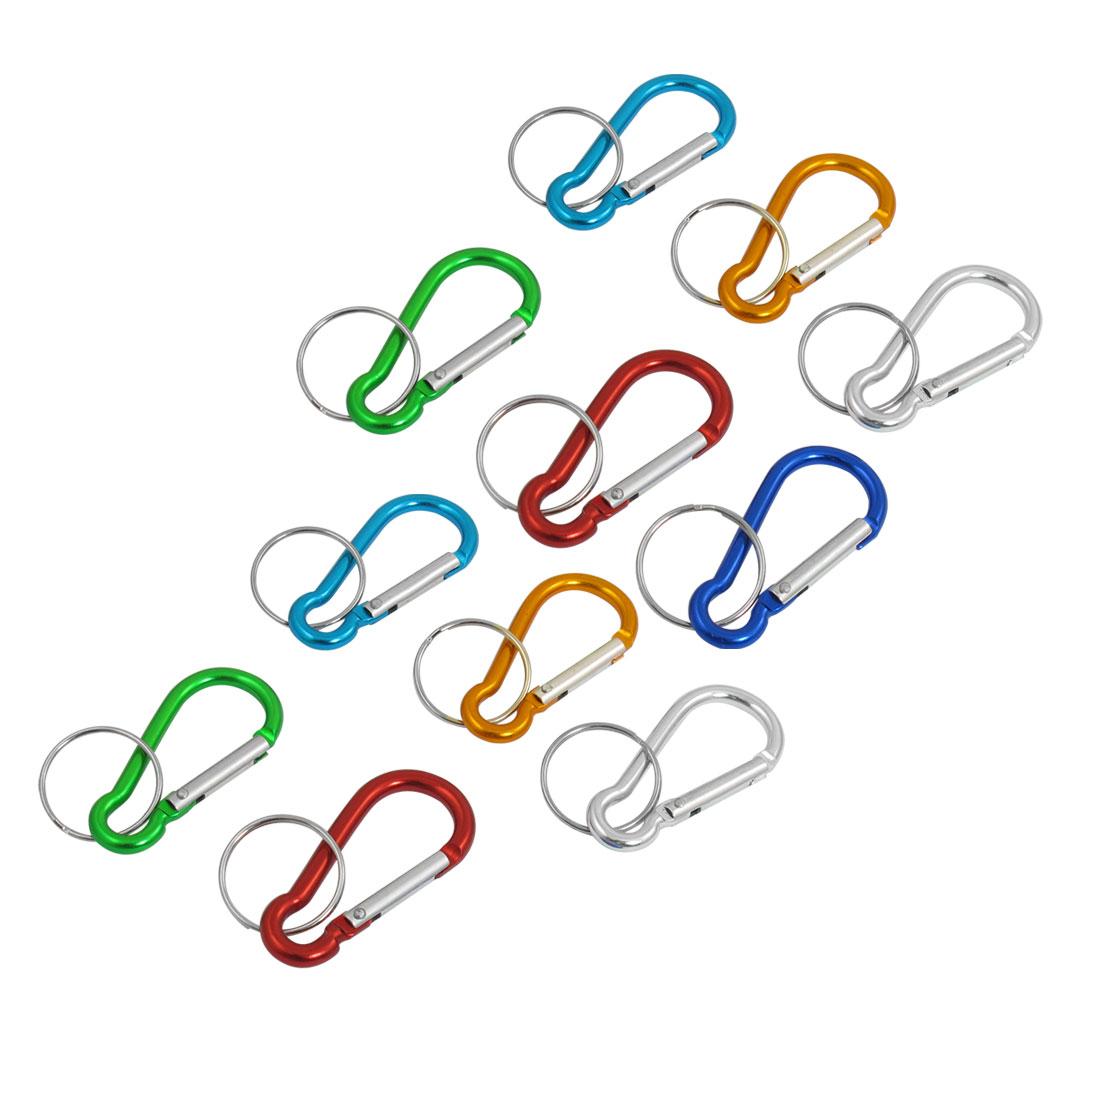 11 Pcs Assorted Color Aluminum D Shape Key Ring Locking Carabiner